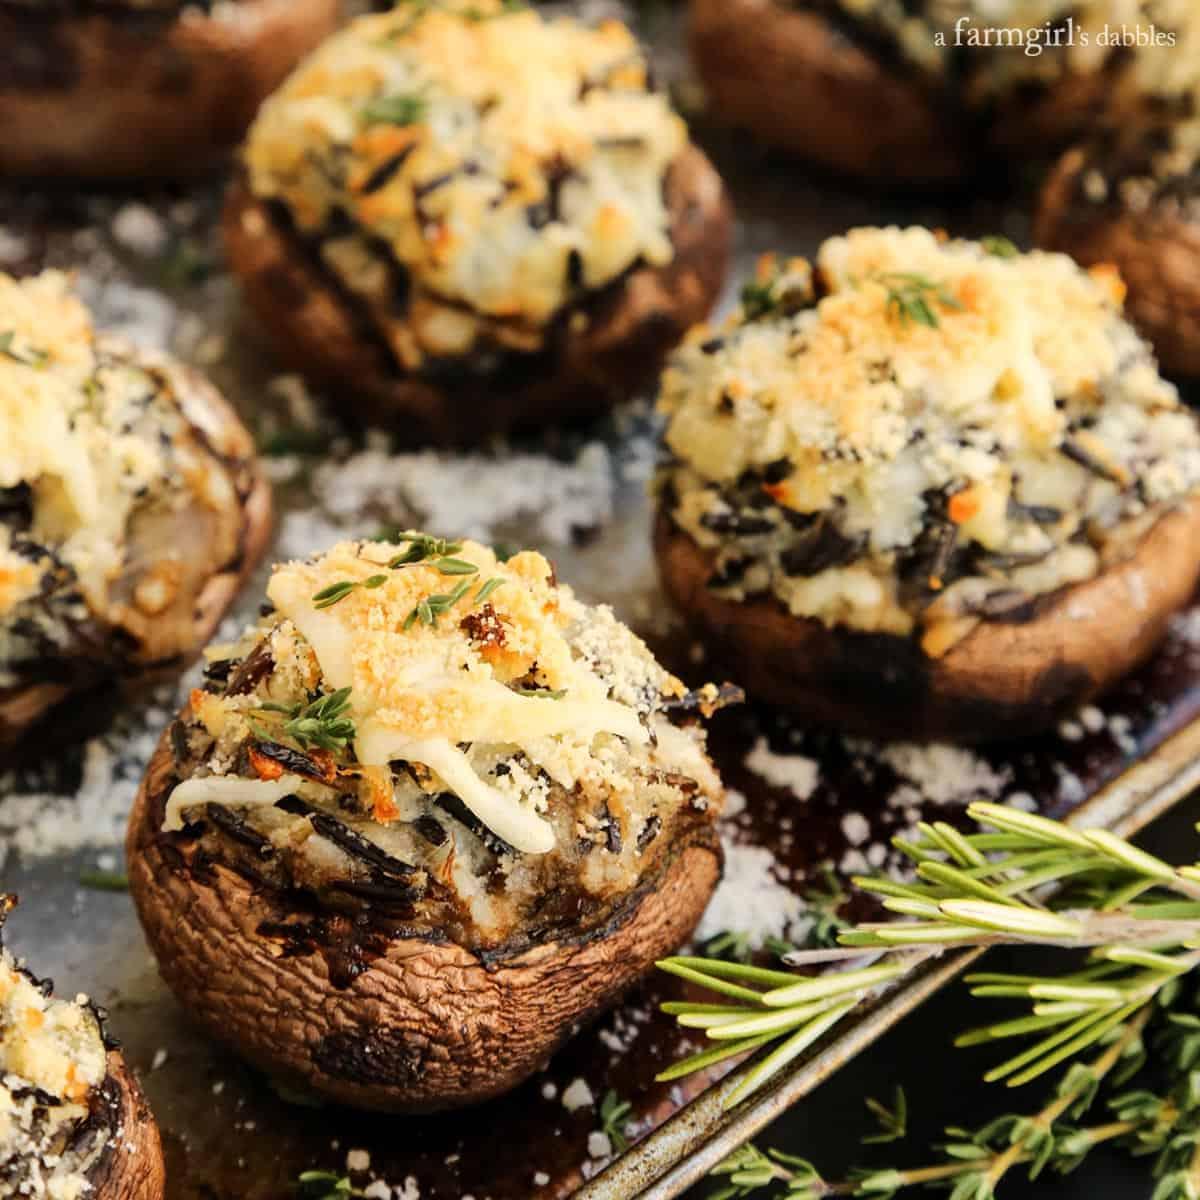 Mashed Potato and Wild Rice Stuffed Mushrooms